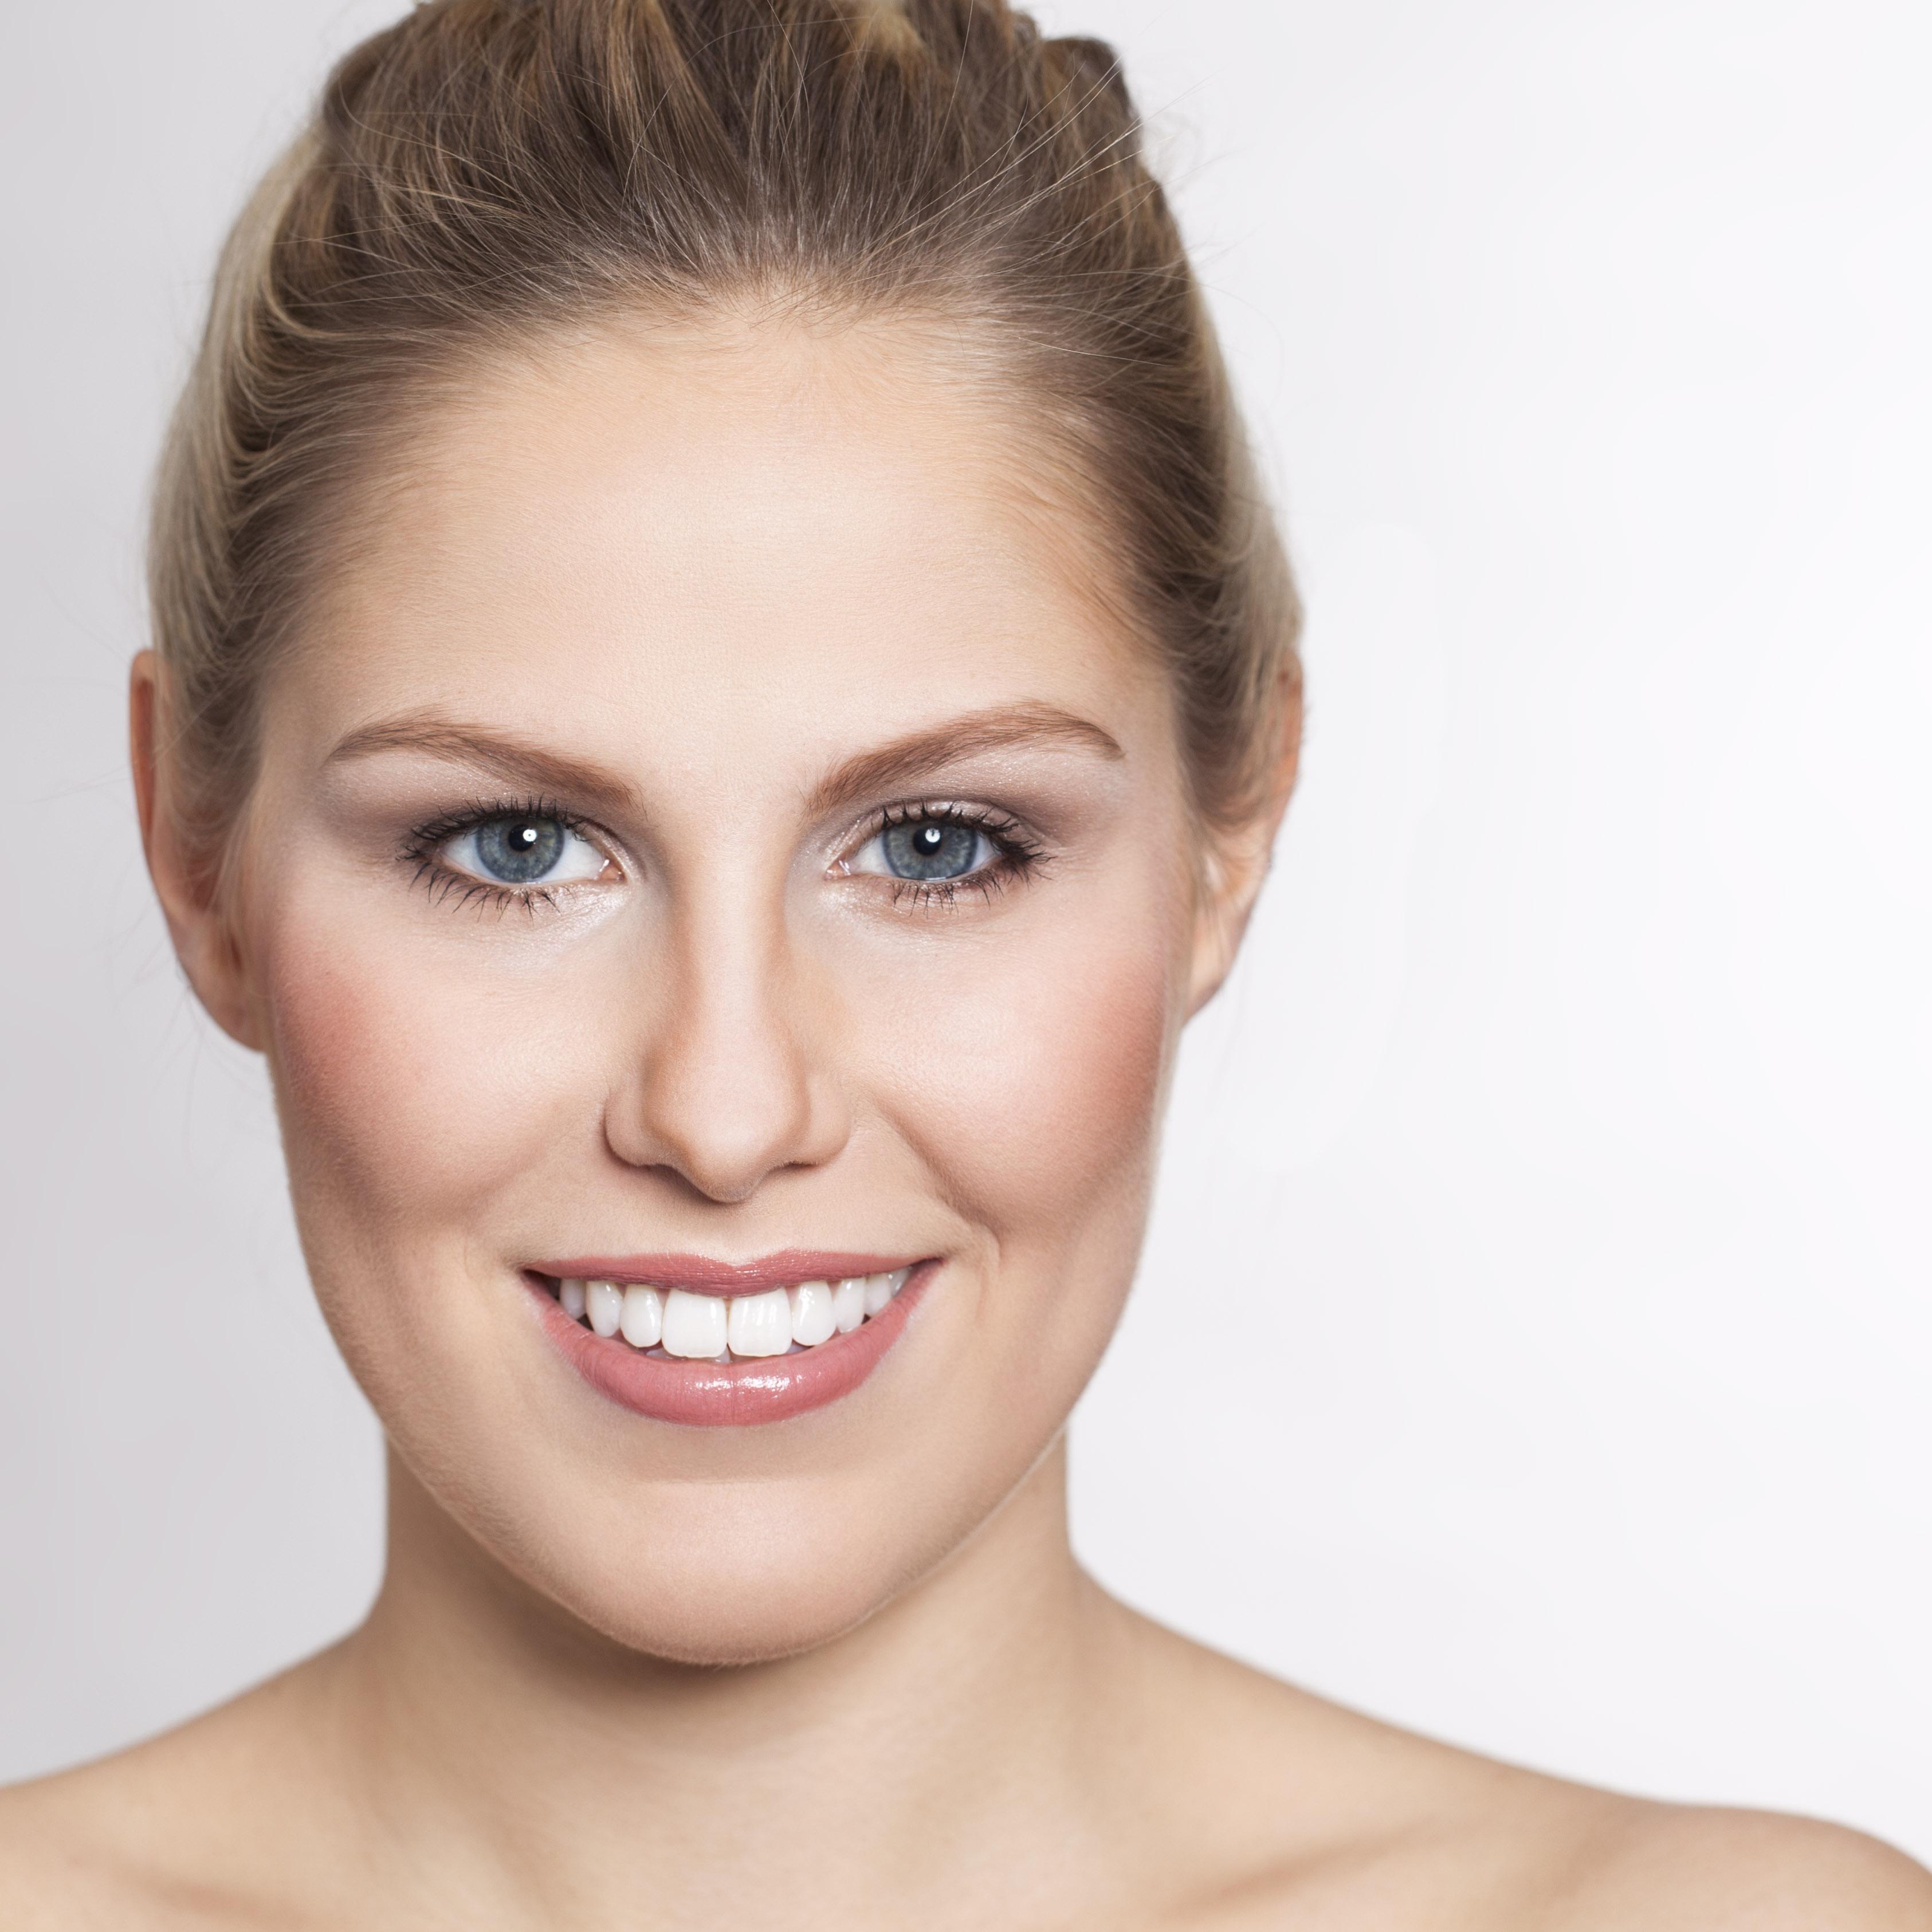 Photo by Lisa Schmidt - Make-up by Julia Dieckmann | Make-up Artist